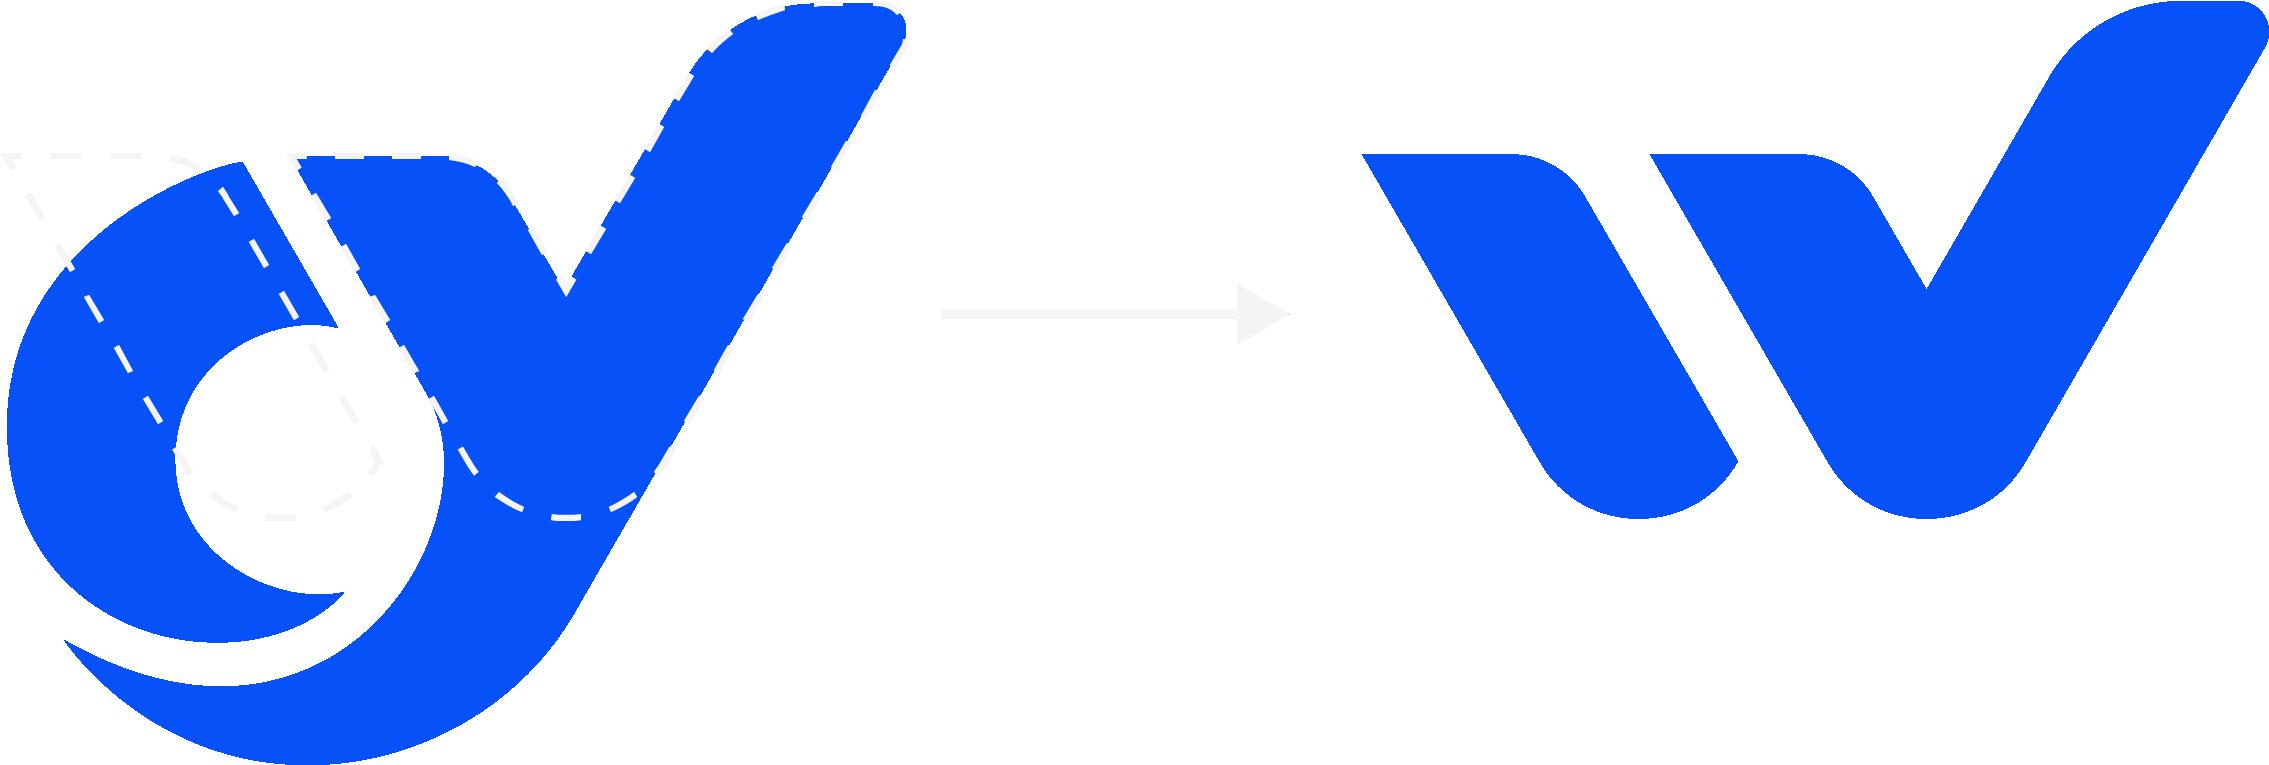 oy-wings-logo-build-01